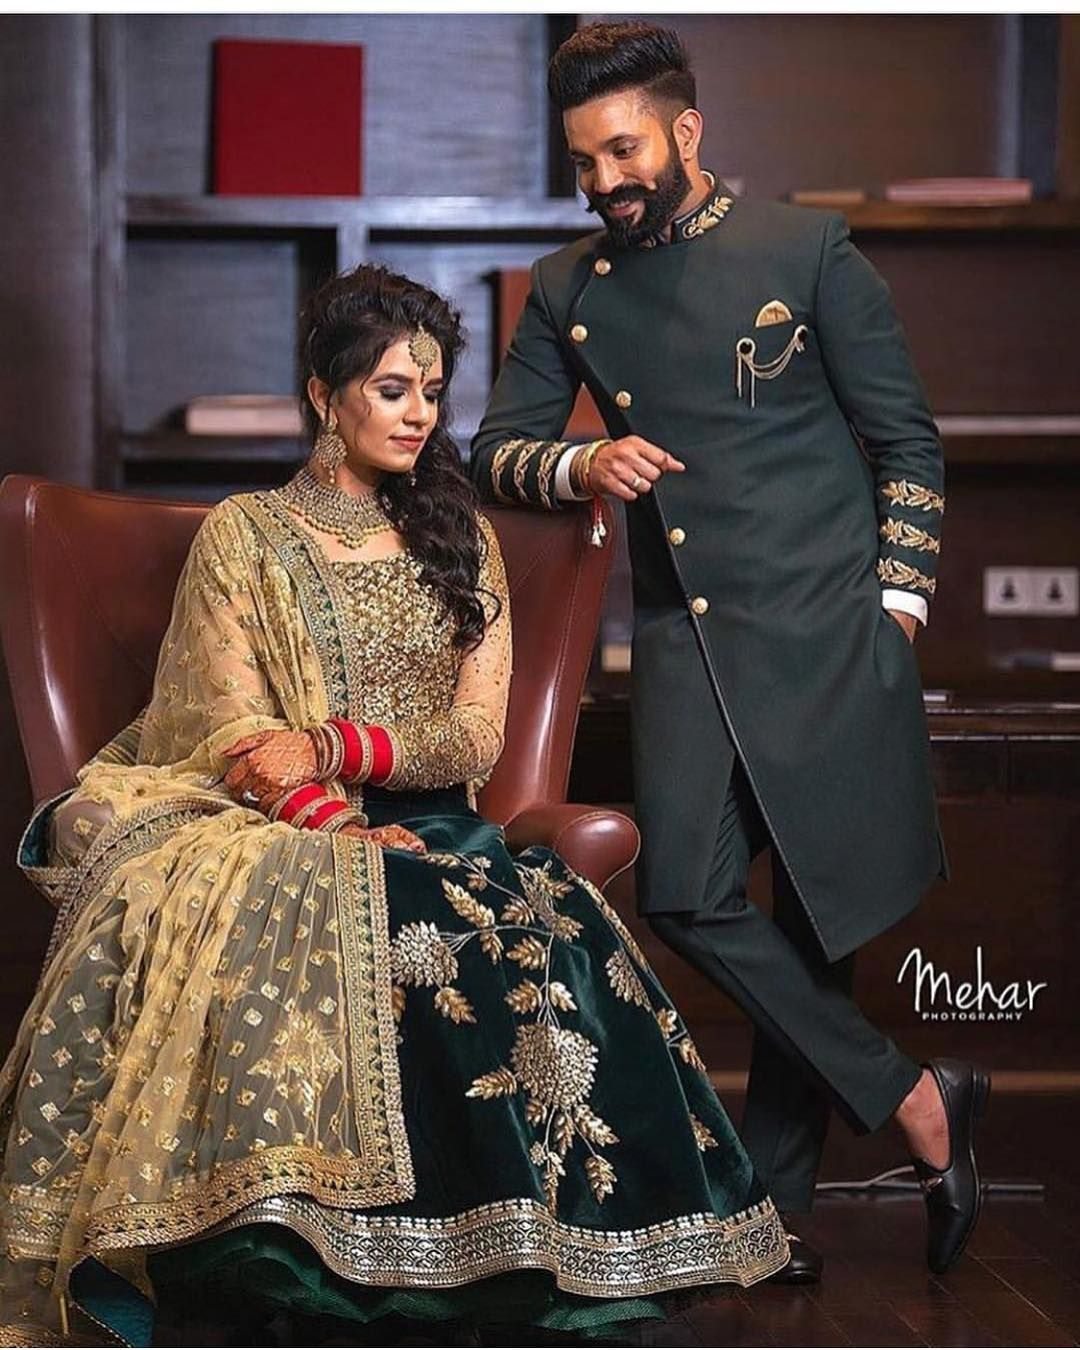 2 695 Likes 6 Comments Punjabi Weddings Punjabi Weddings On Instagram Wedding Outfits For Groom Indian Wedding Photography Couples Couple Wedding Dress [ 1350 x 1080 Pixel ]